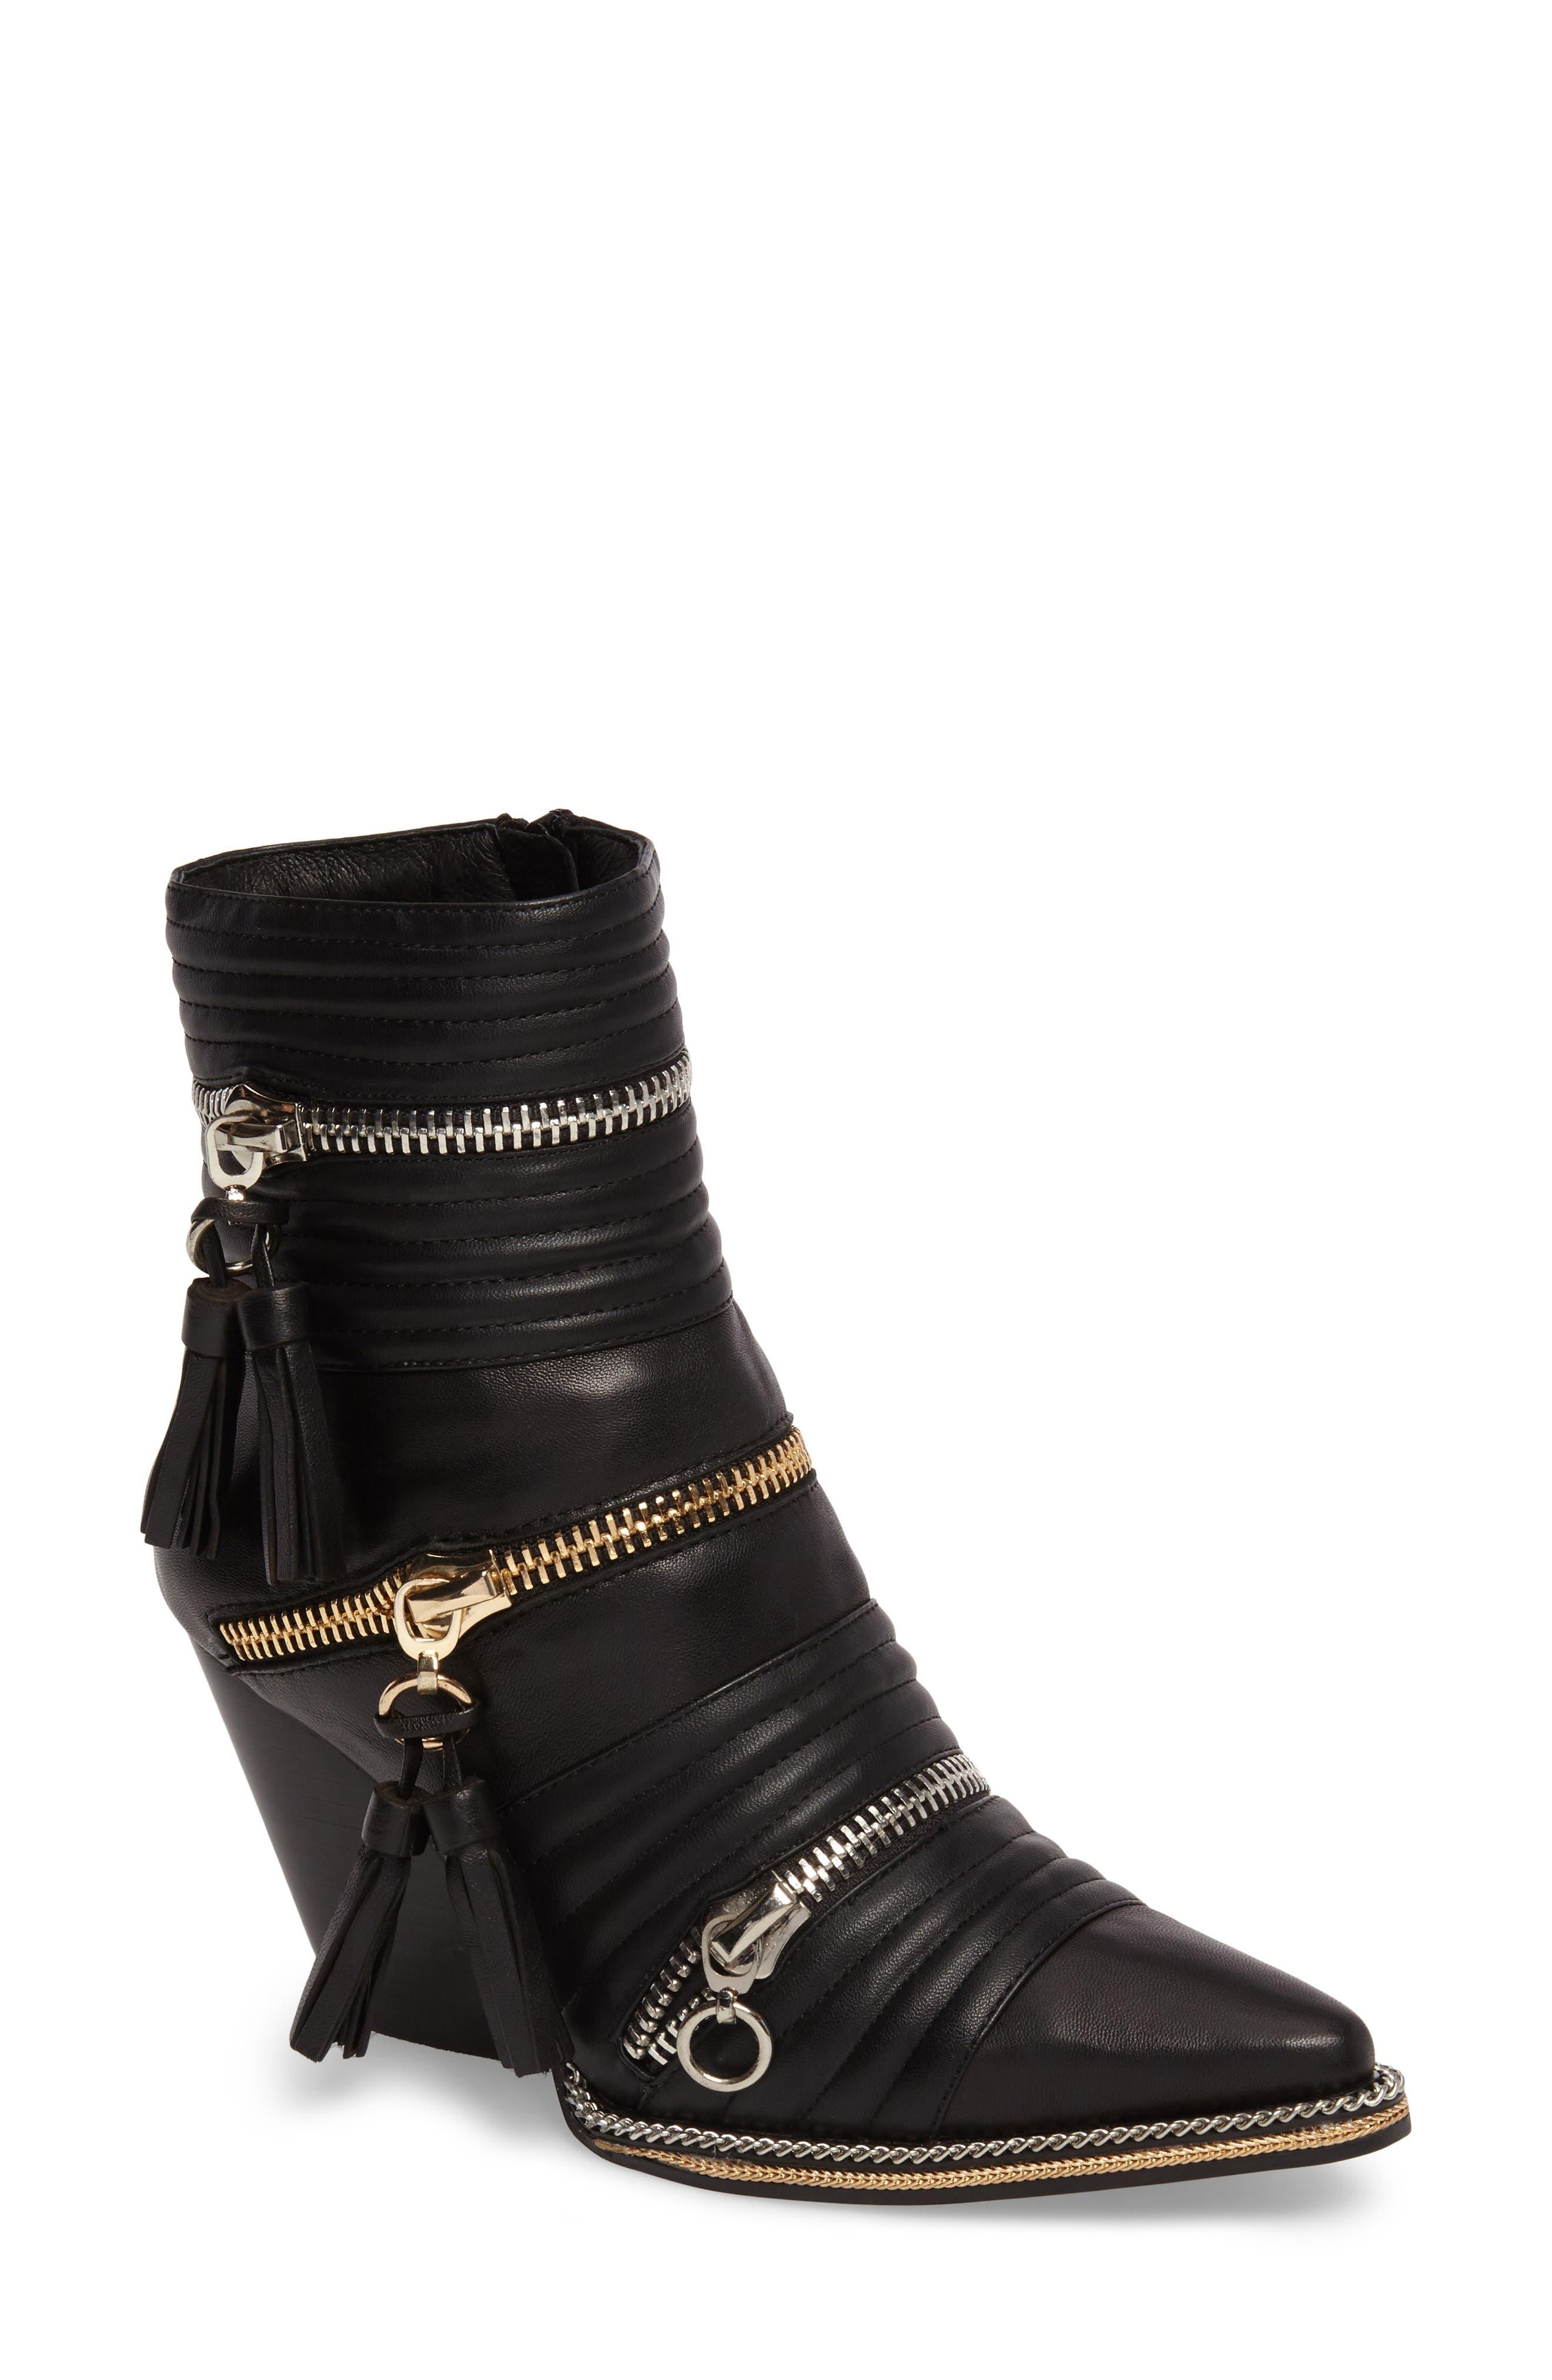 Main Image - Jeffrey Campbell Tenzin Chain Pointy Toe Boot (Women)